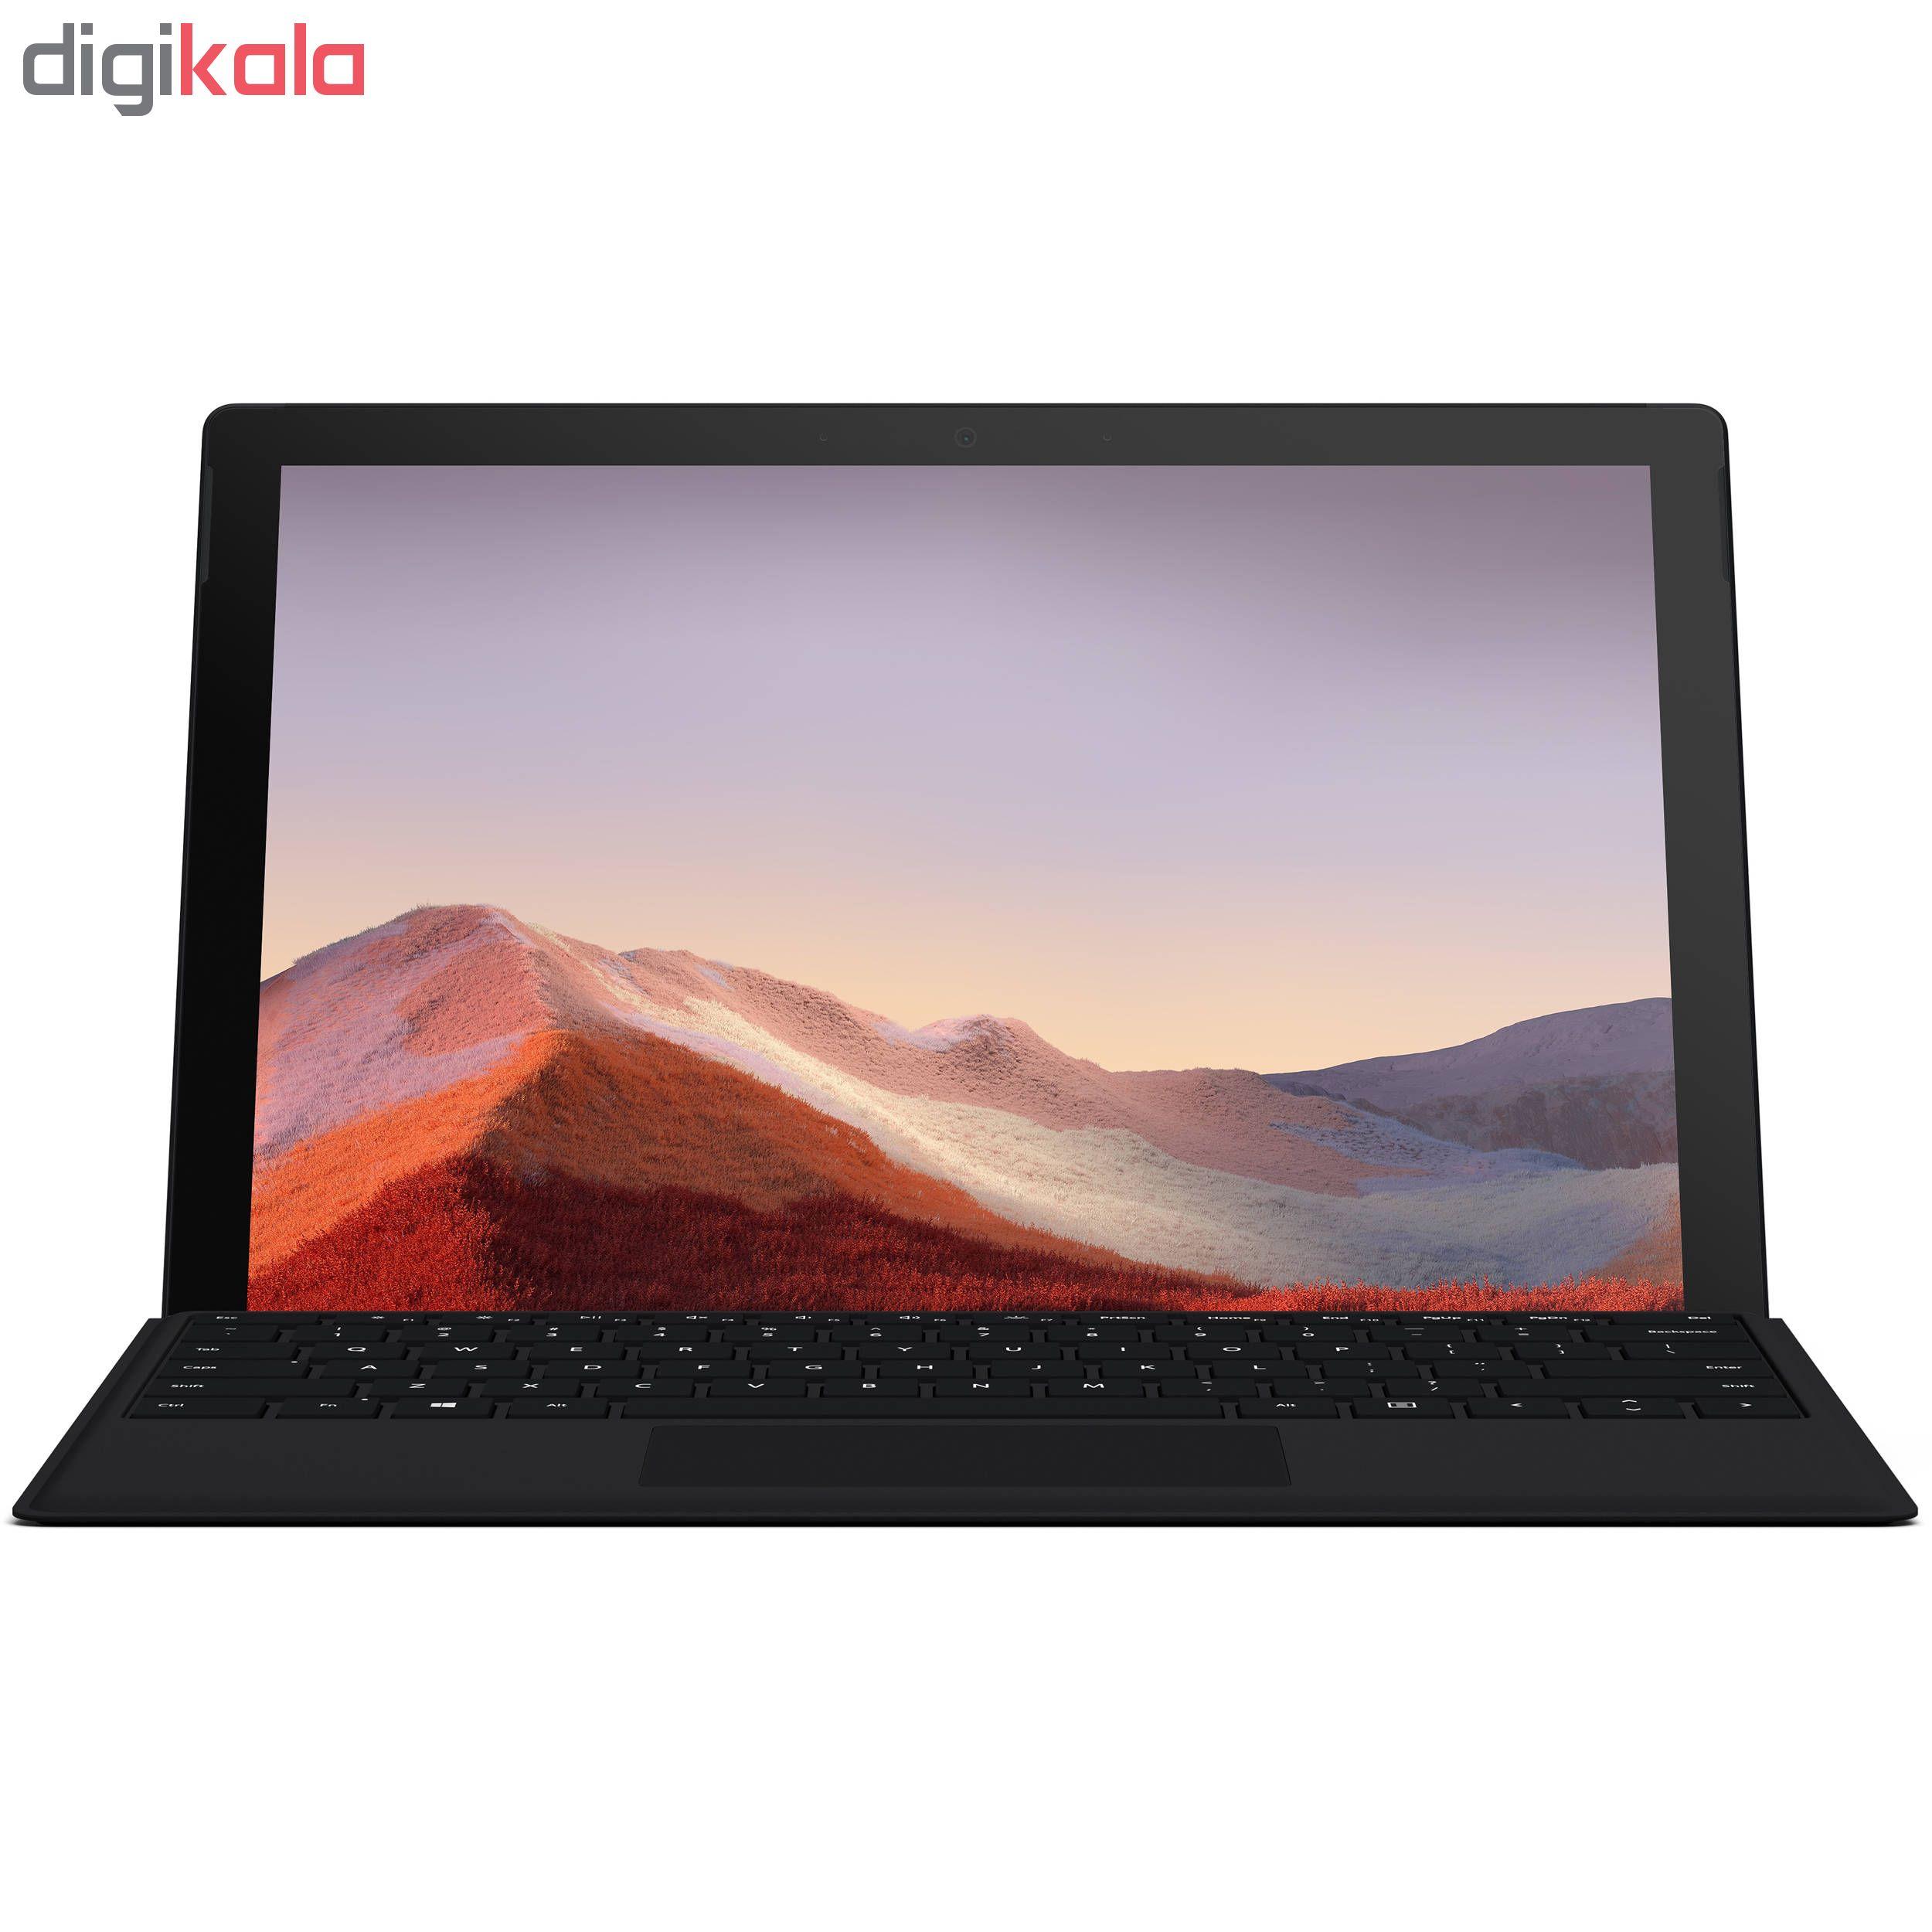 تبلت مایکروسافت مدل Surface Pro 7 - F به همراه کیبورد Black Type Cover main 1 1